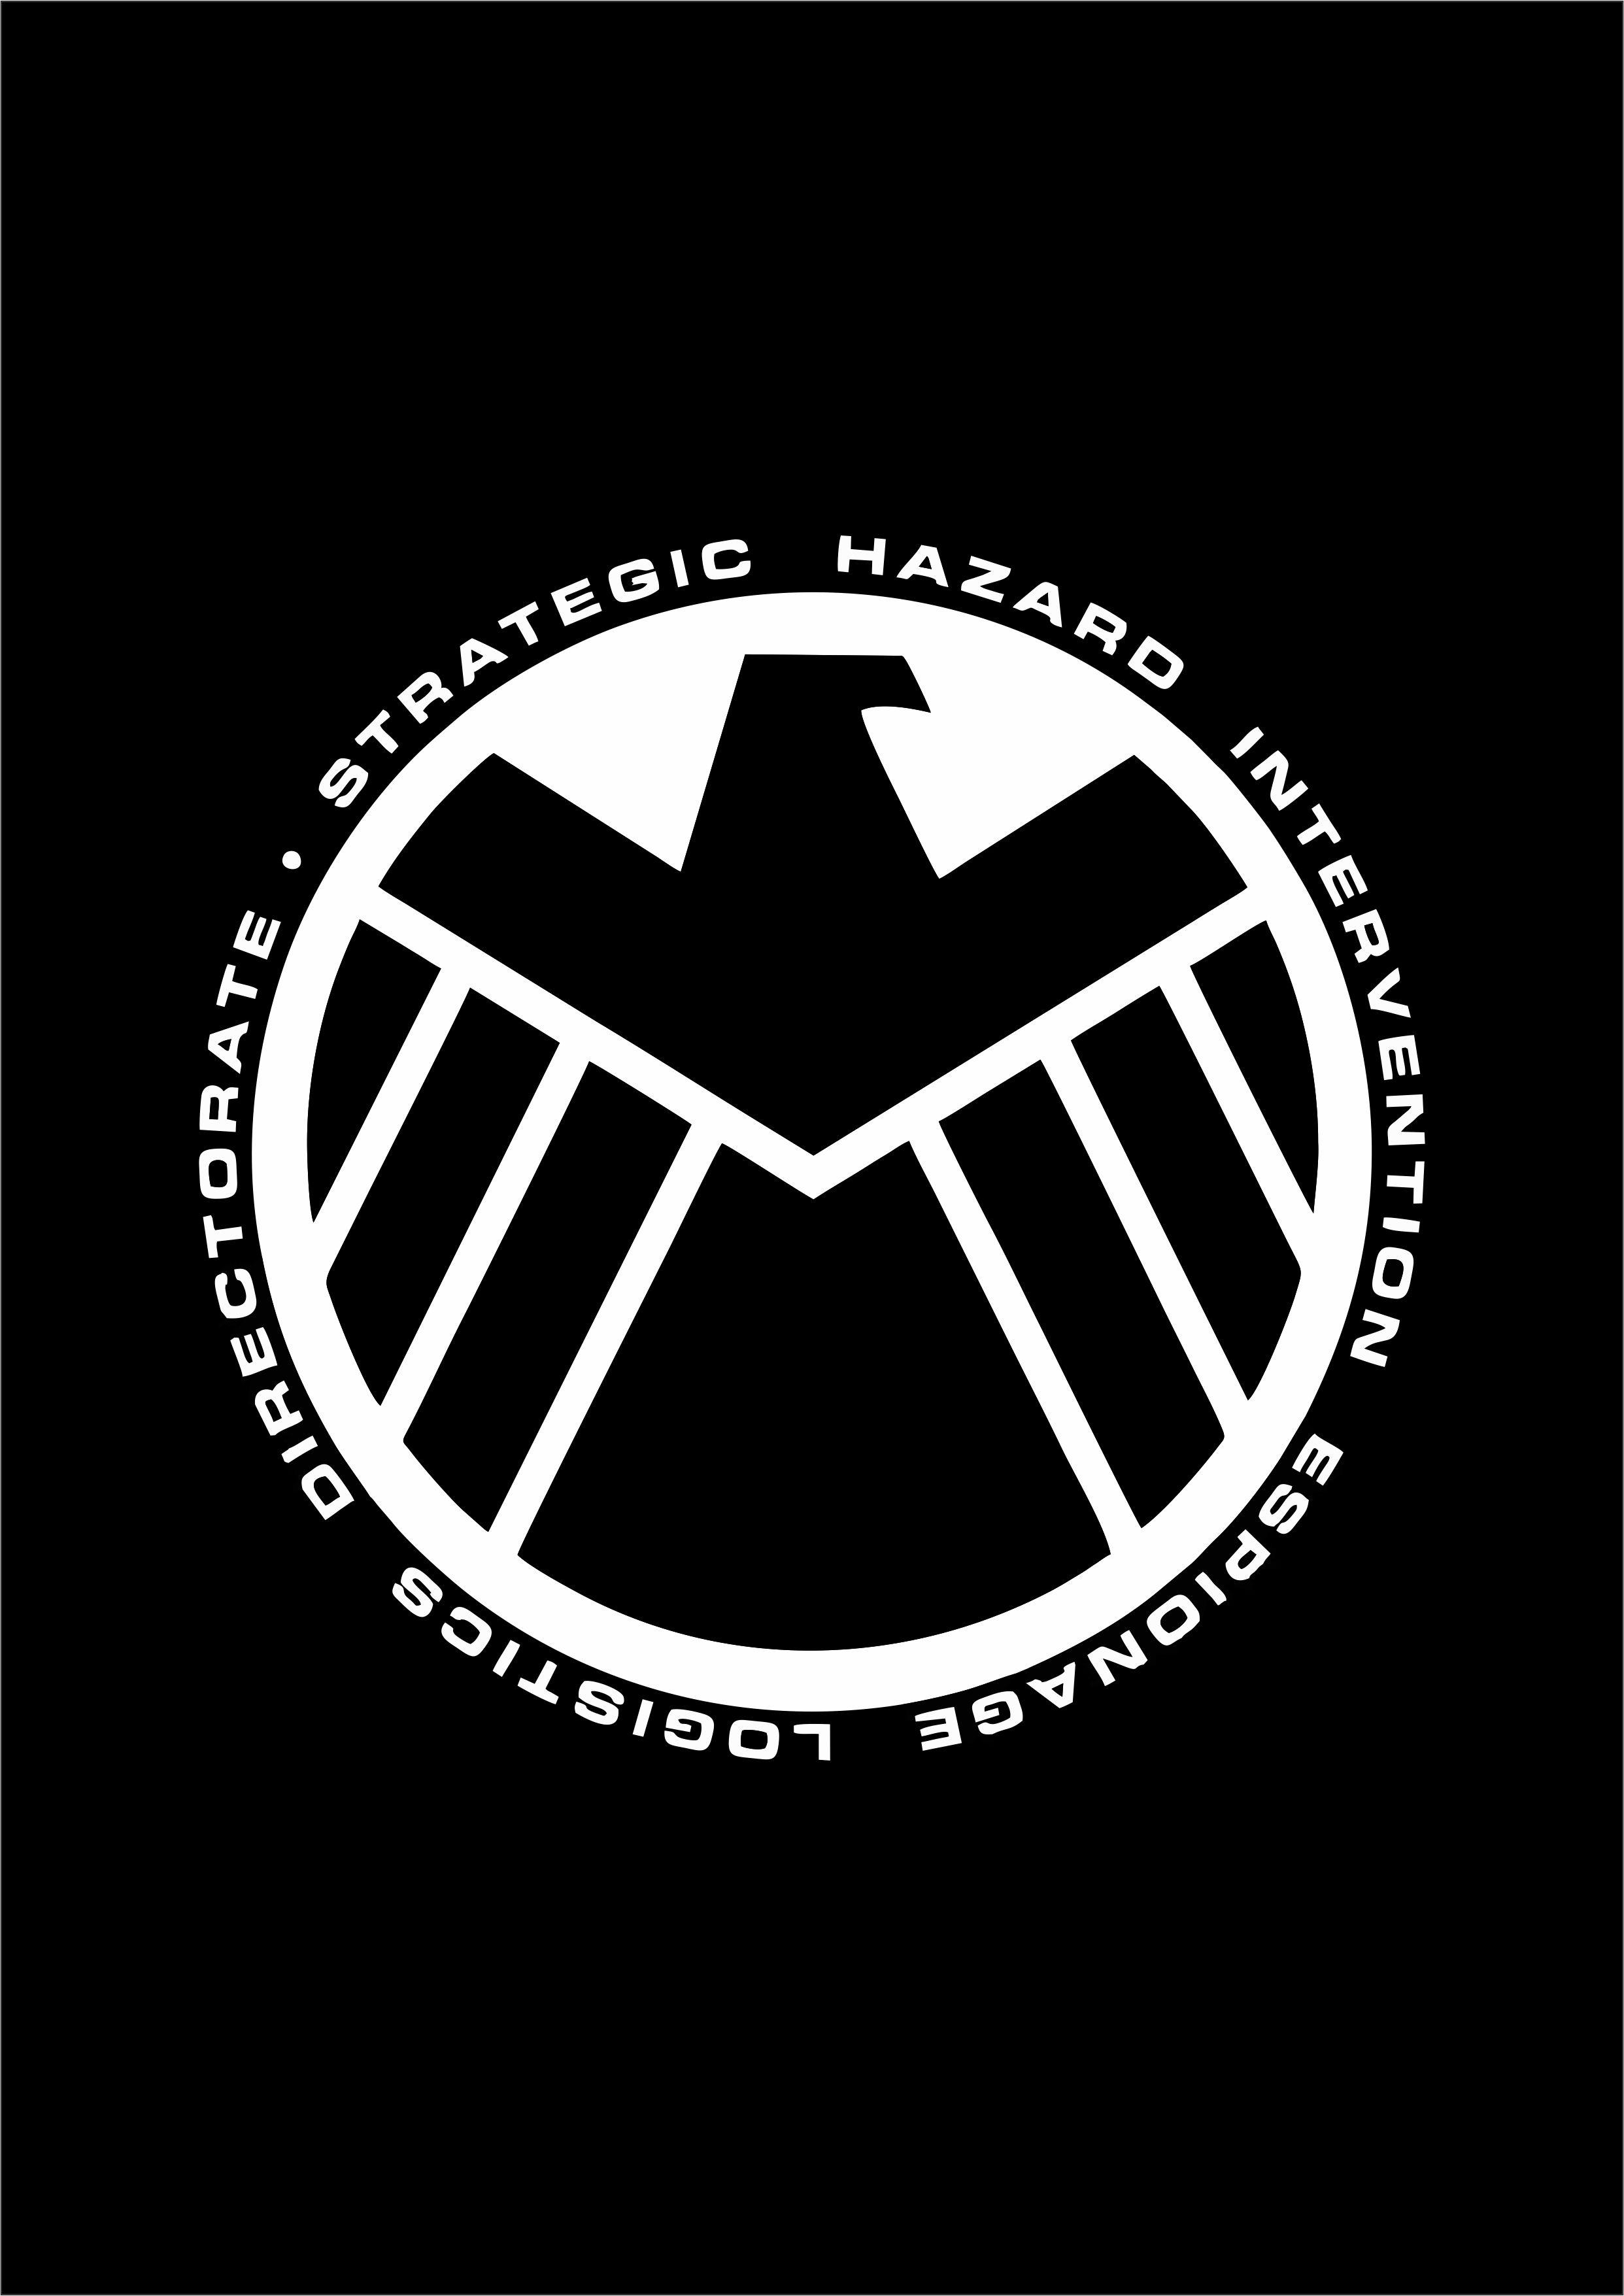 Camisa Exclusiva The Avengers Shield Inkdea Design